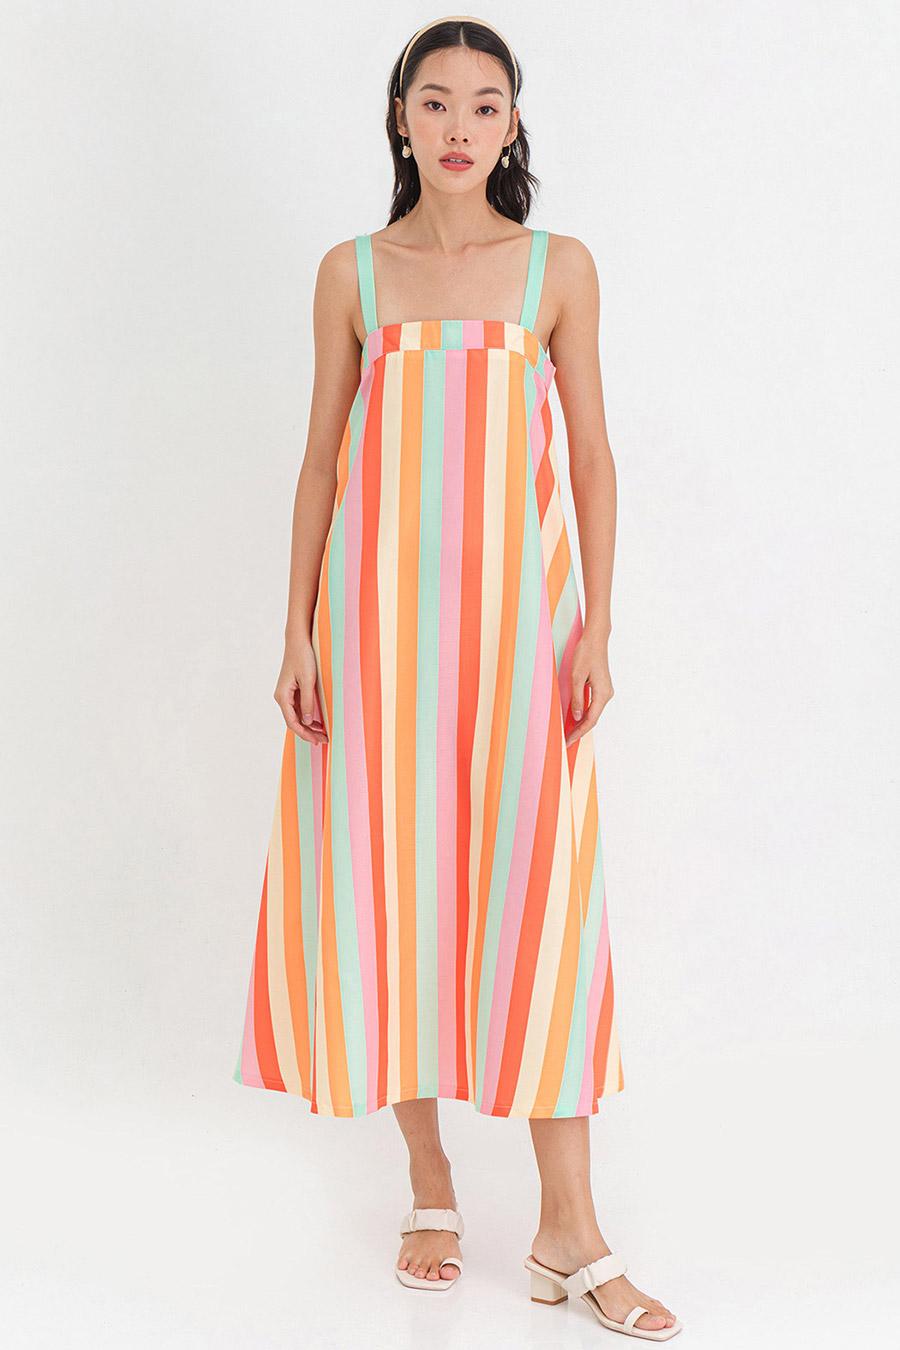 *BO* FILY DRESS - POPSICLES 2.0 [BY MODPARADE]